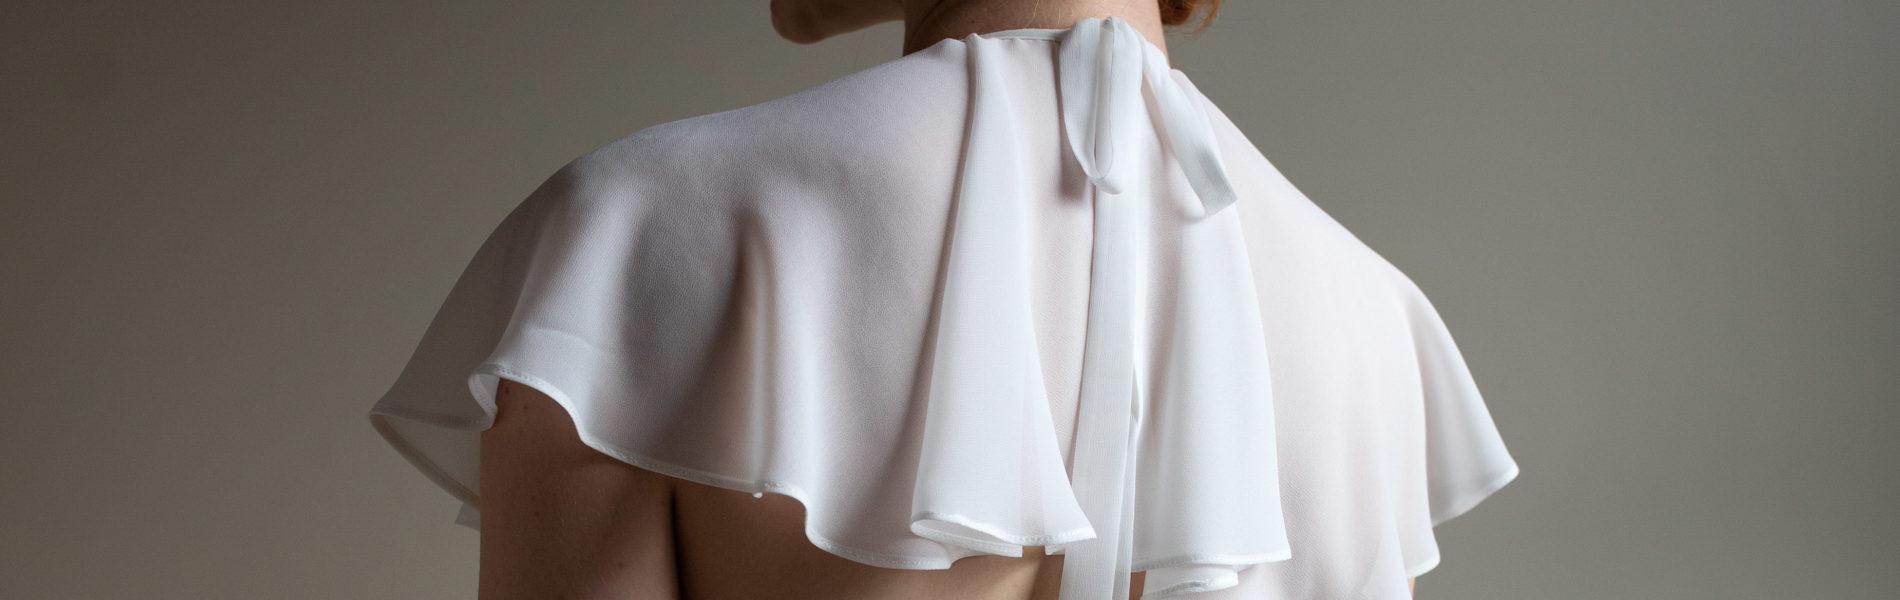 lisa lyons bridal imogene dress